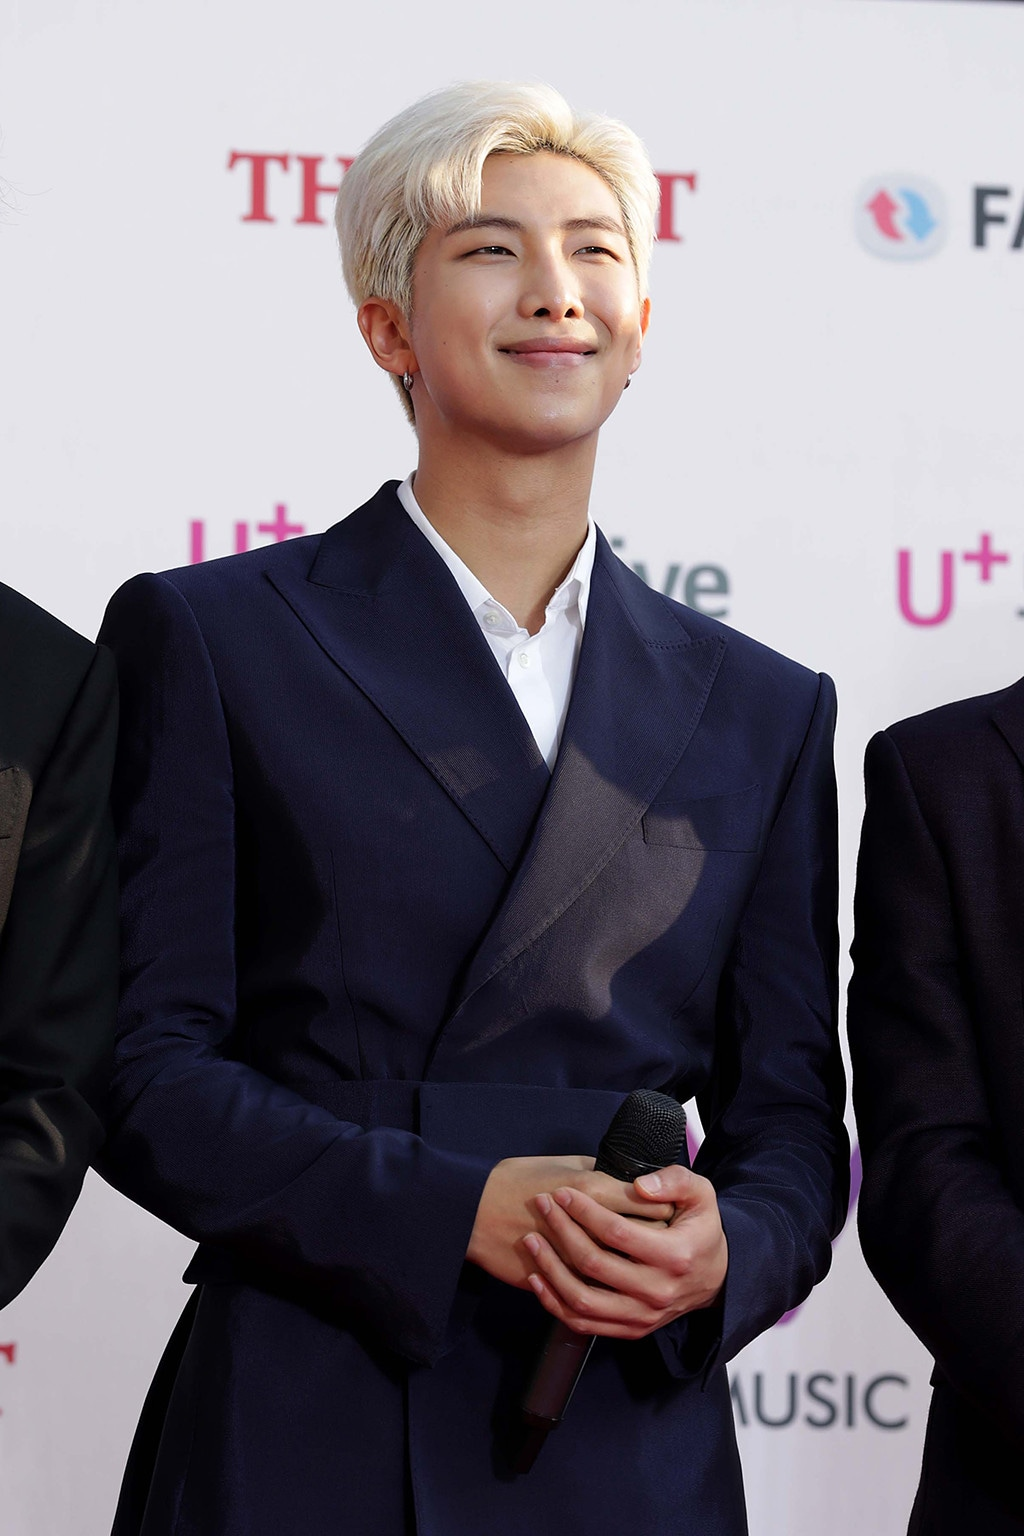 RM, BTS, The Fact Music Awards 2019